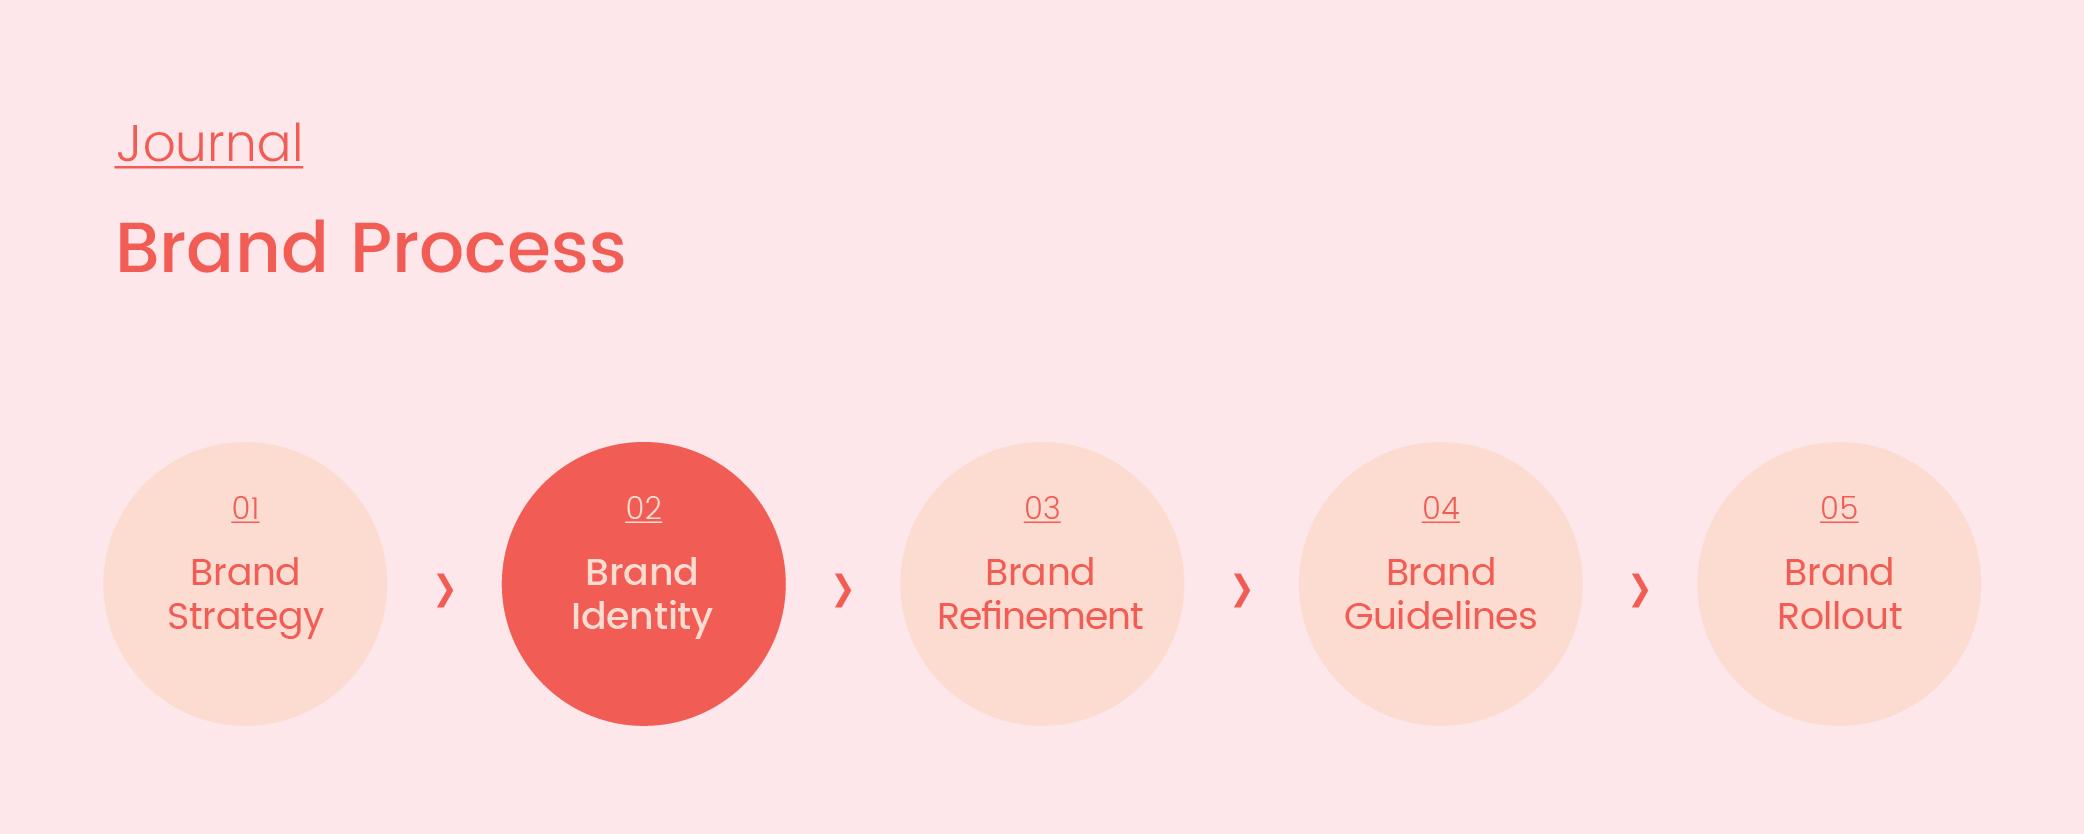 Brand Process_02_Identity_Artboard 1 copy 3.png